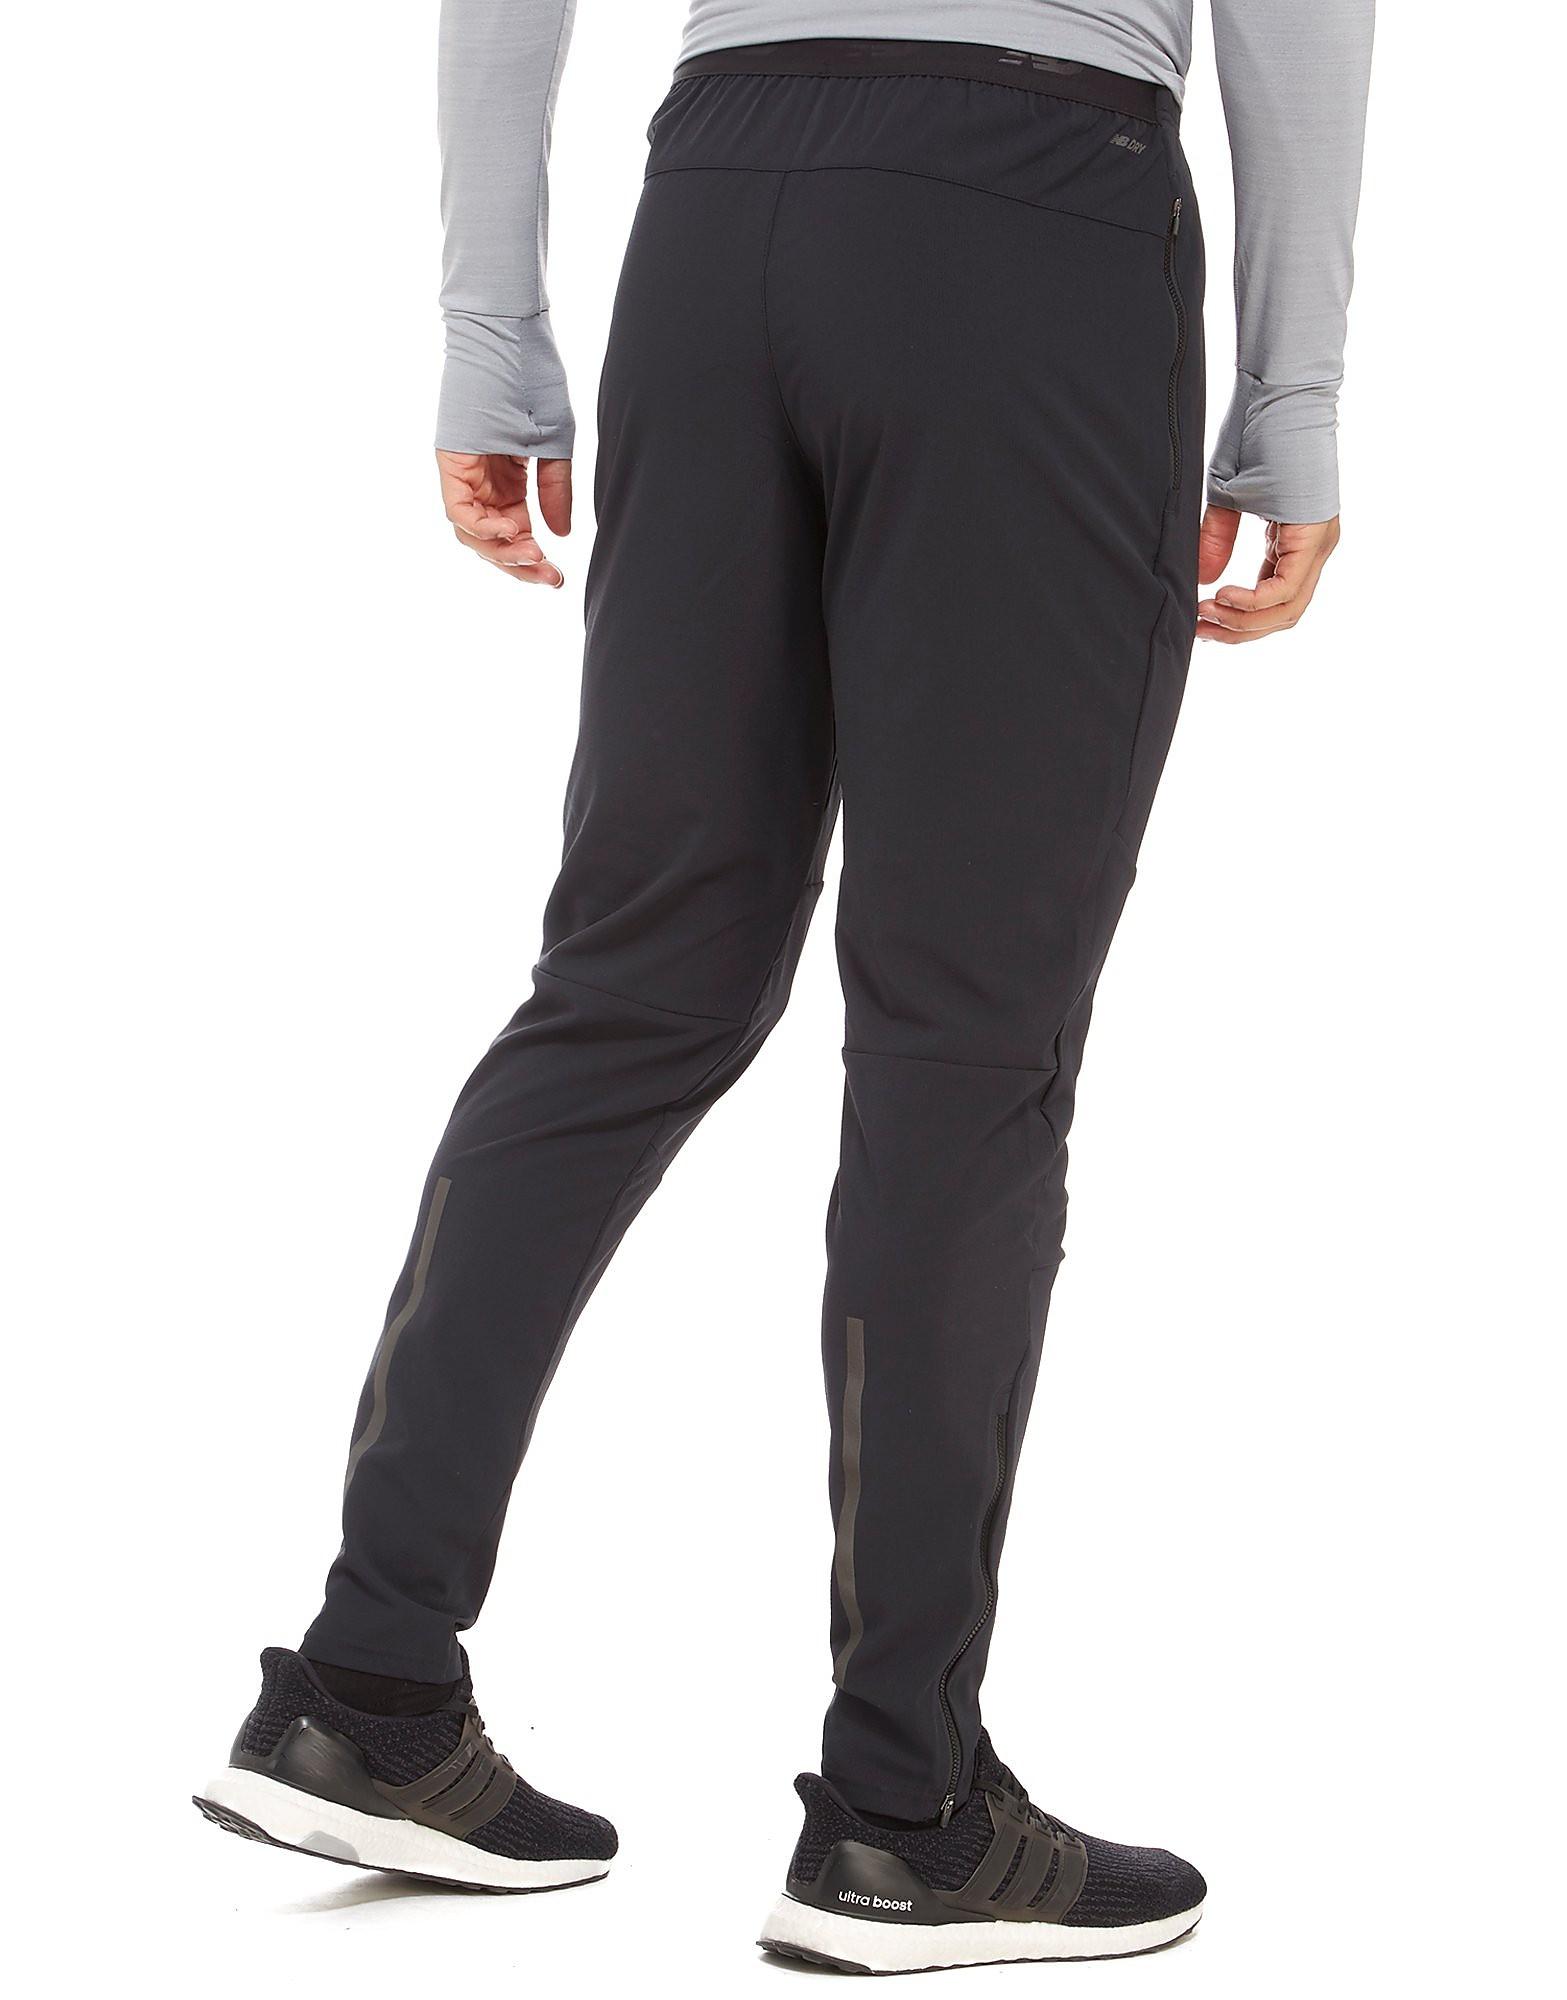 New Balance Max Intensity Pants